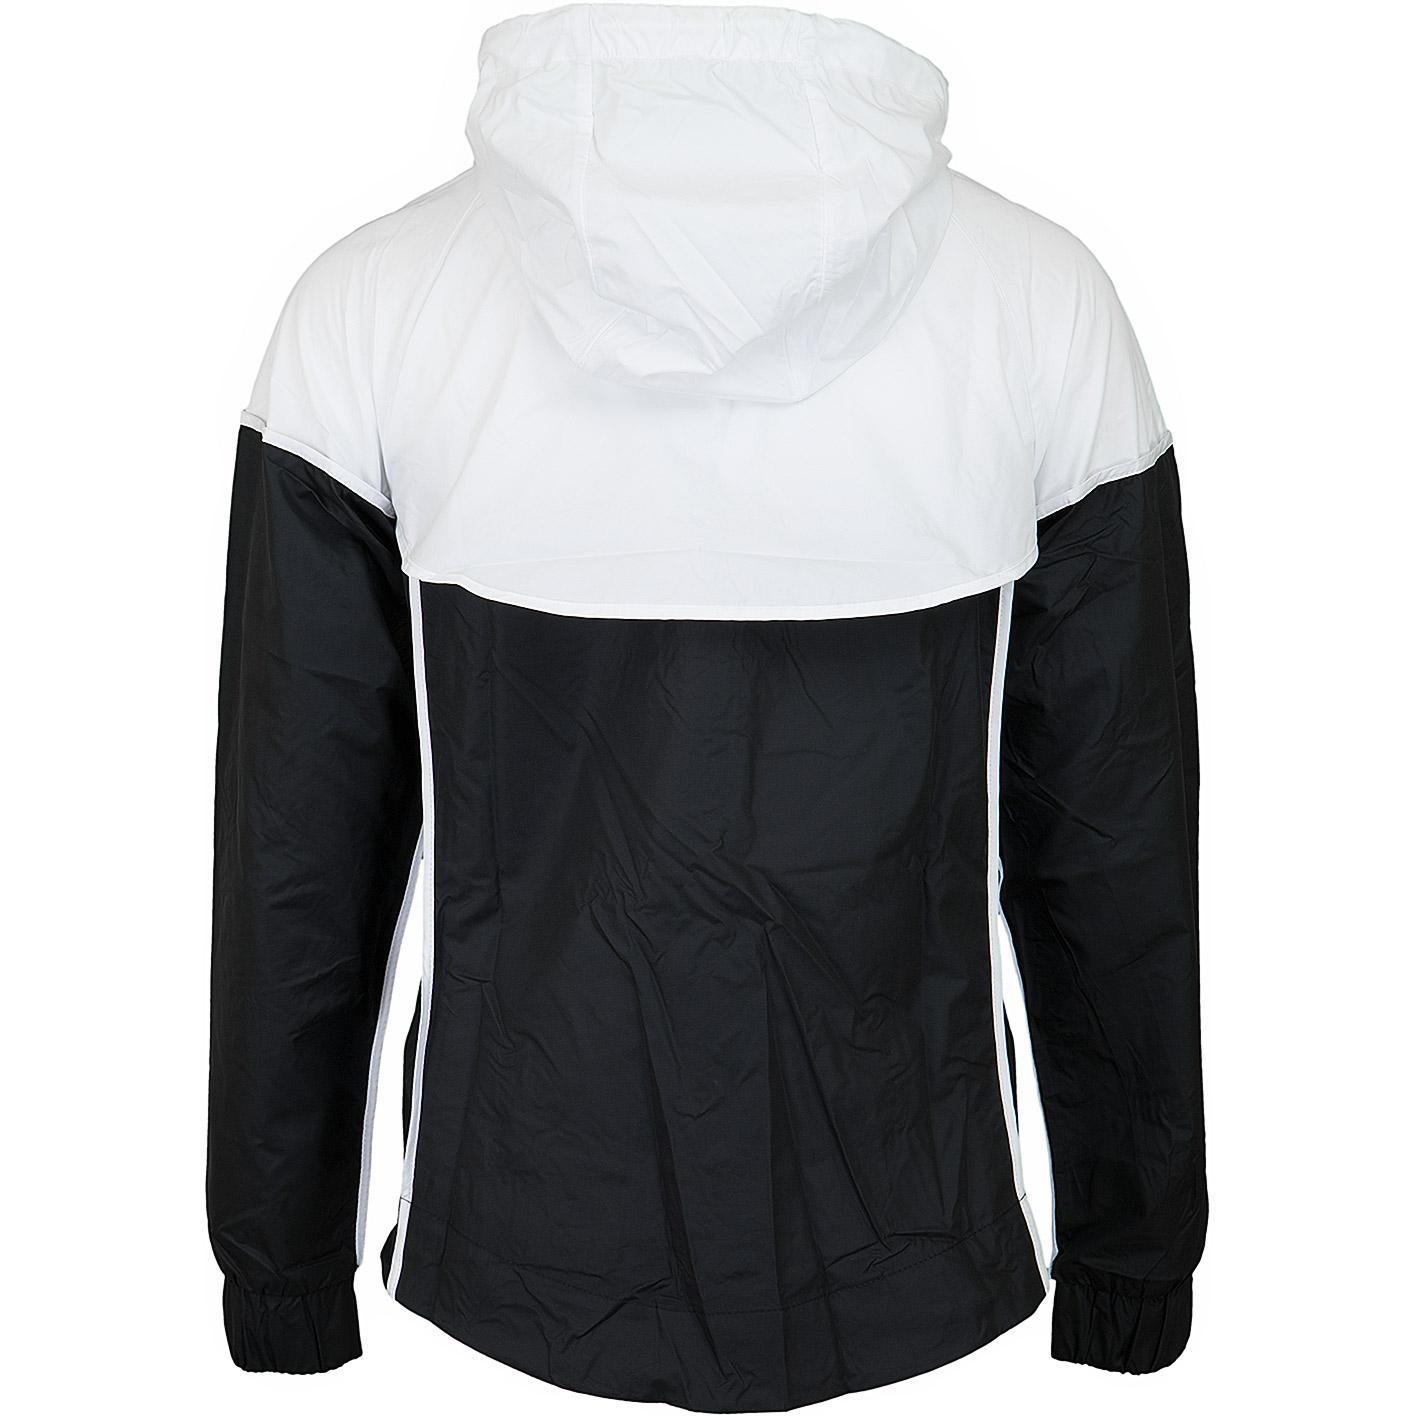 48e3ad15081c8d ☆ Nike Damen Jacke Windrunner schwarz/weiß - hier bestellen!